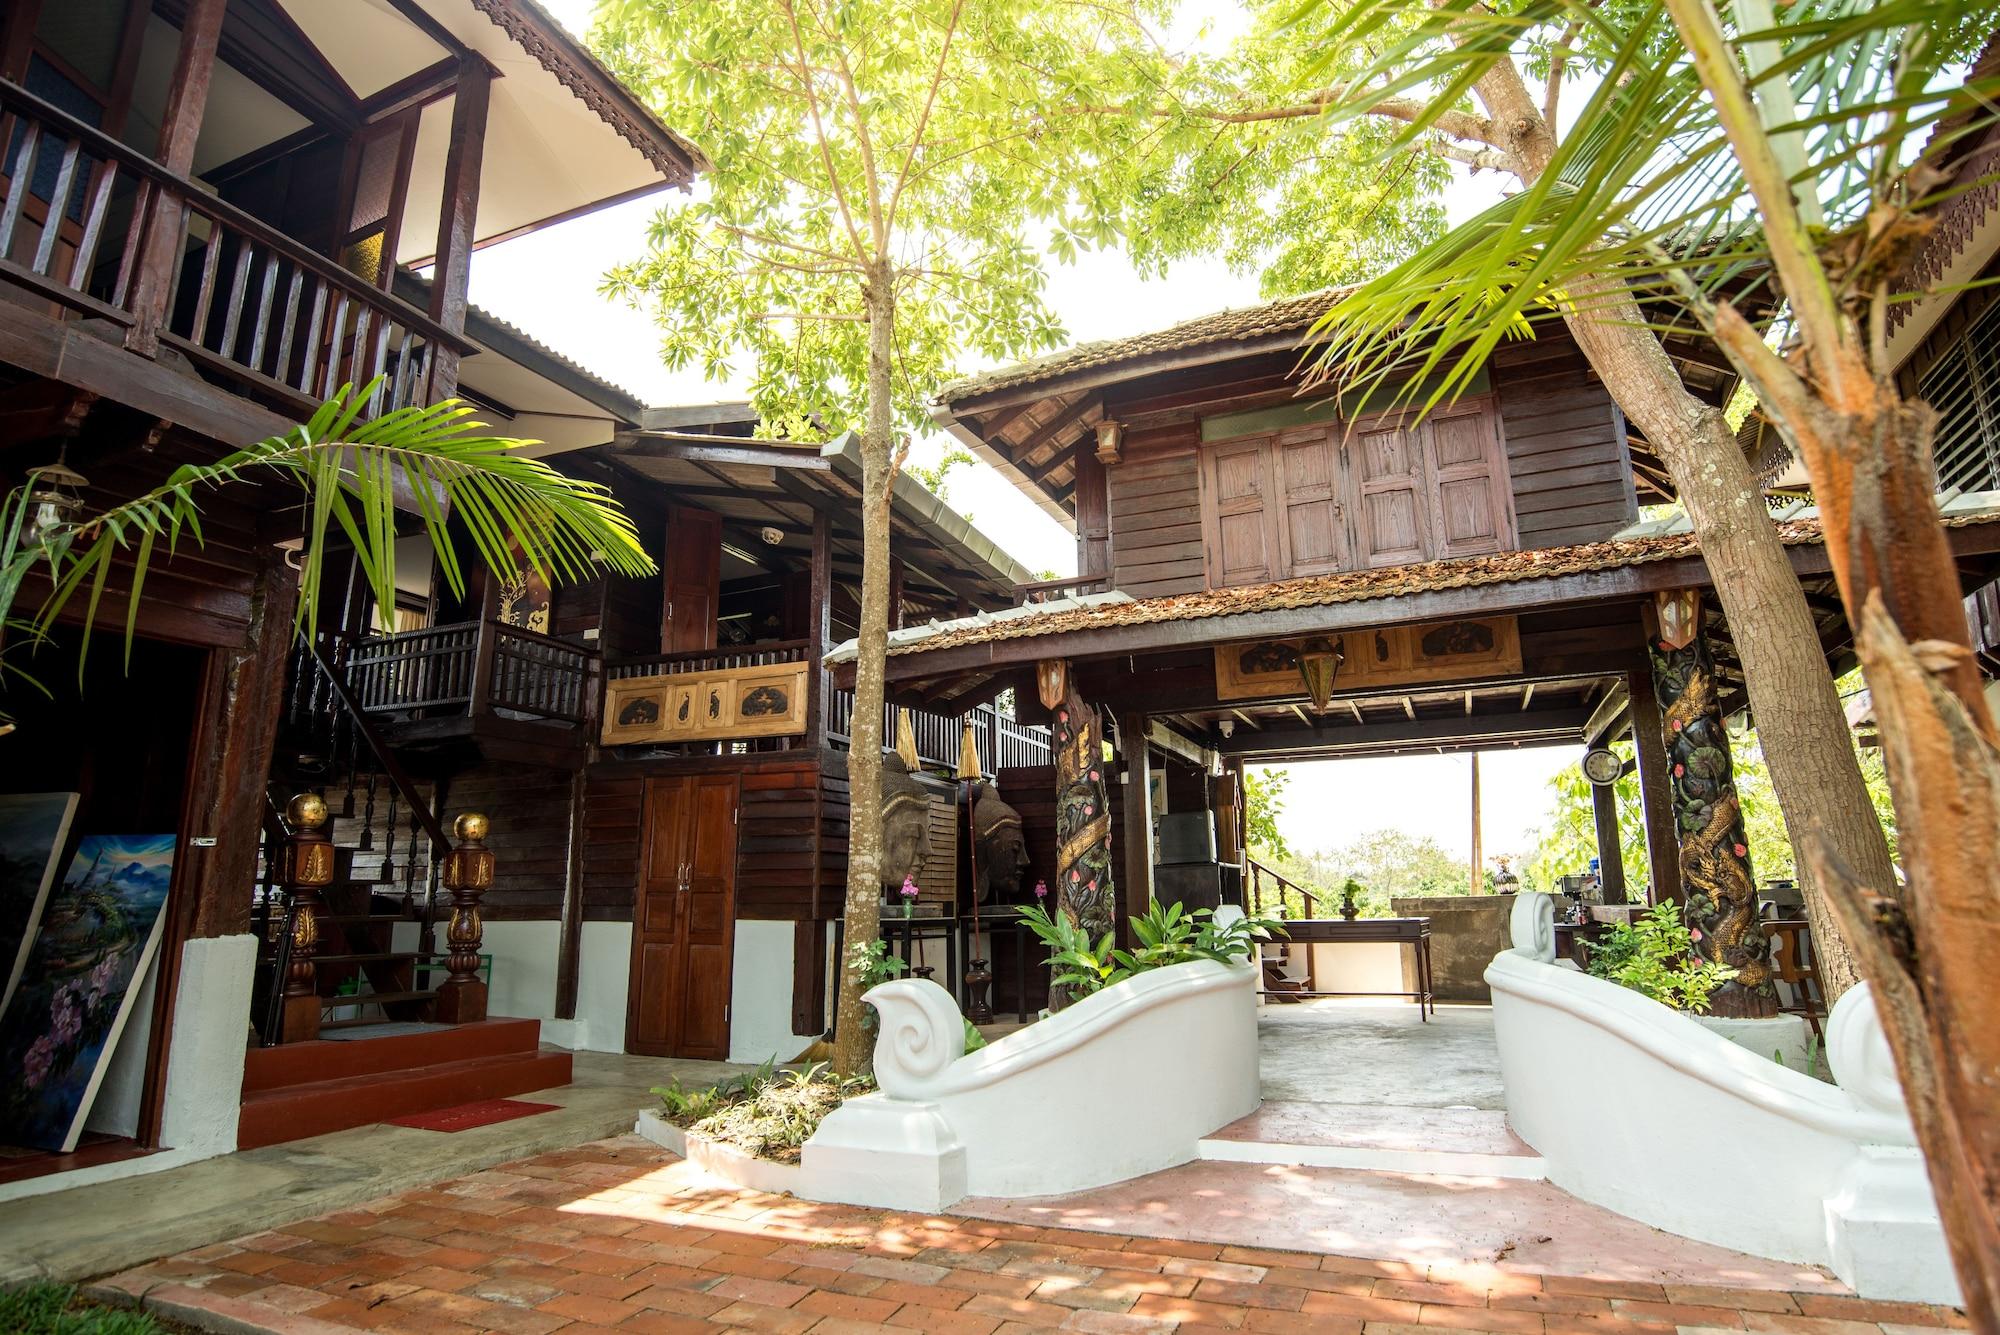 Boon Home Stay Arts and Crafts, San Kamphaeng